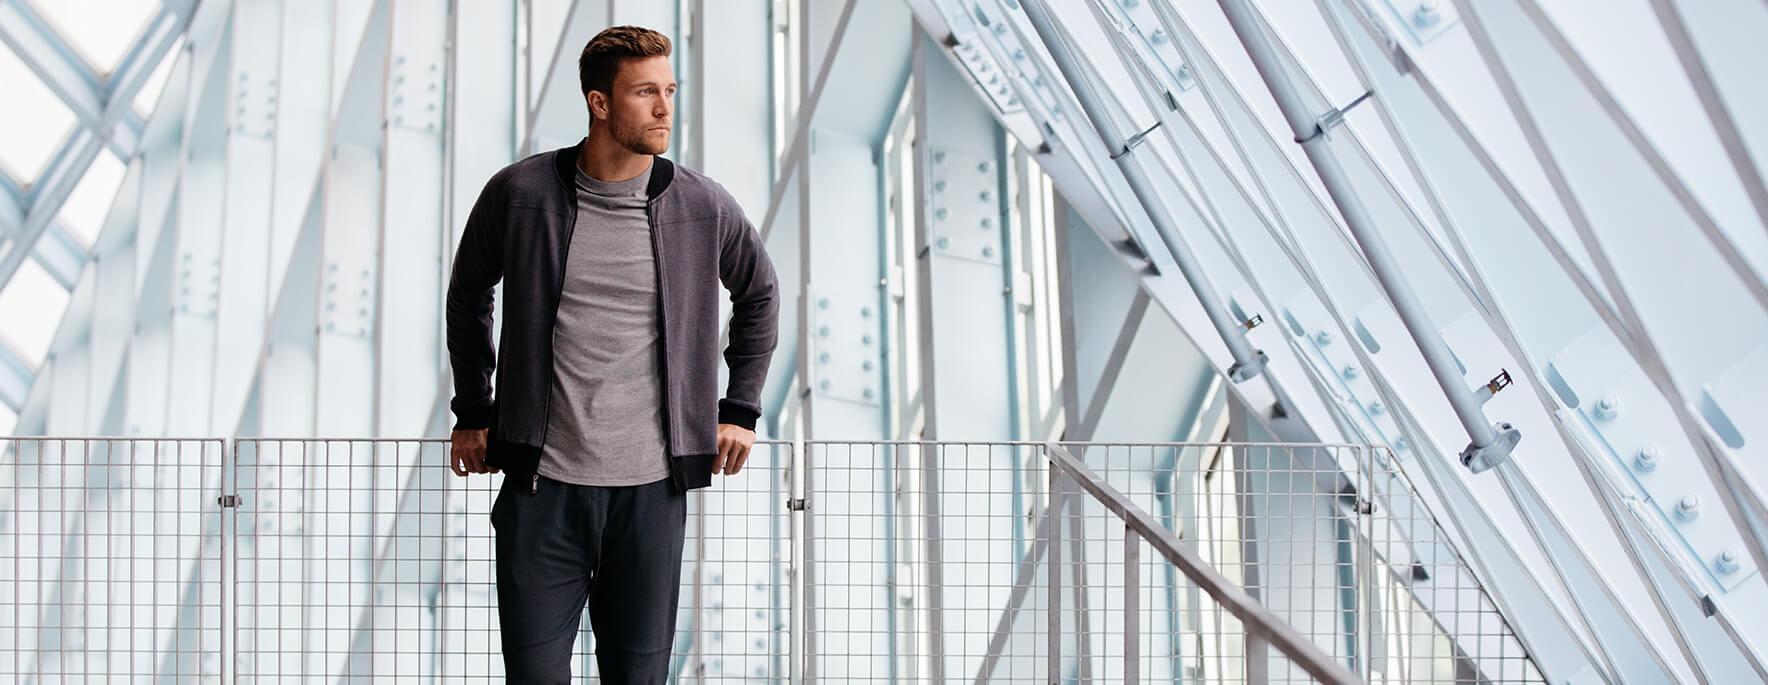 city styles mens athleisure clothing- tasc performance